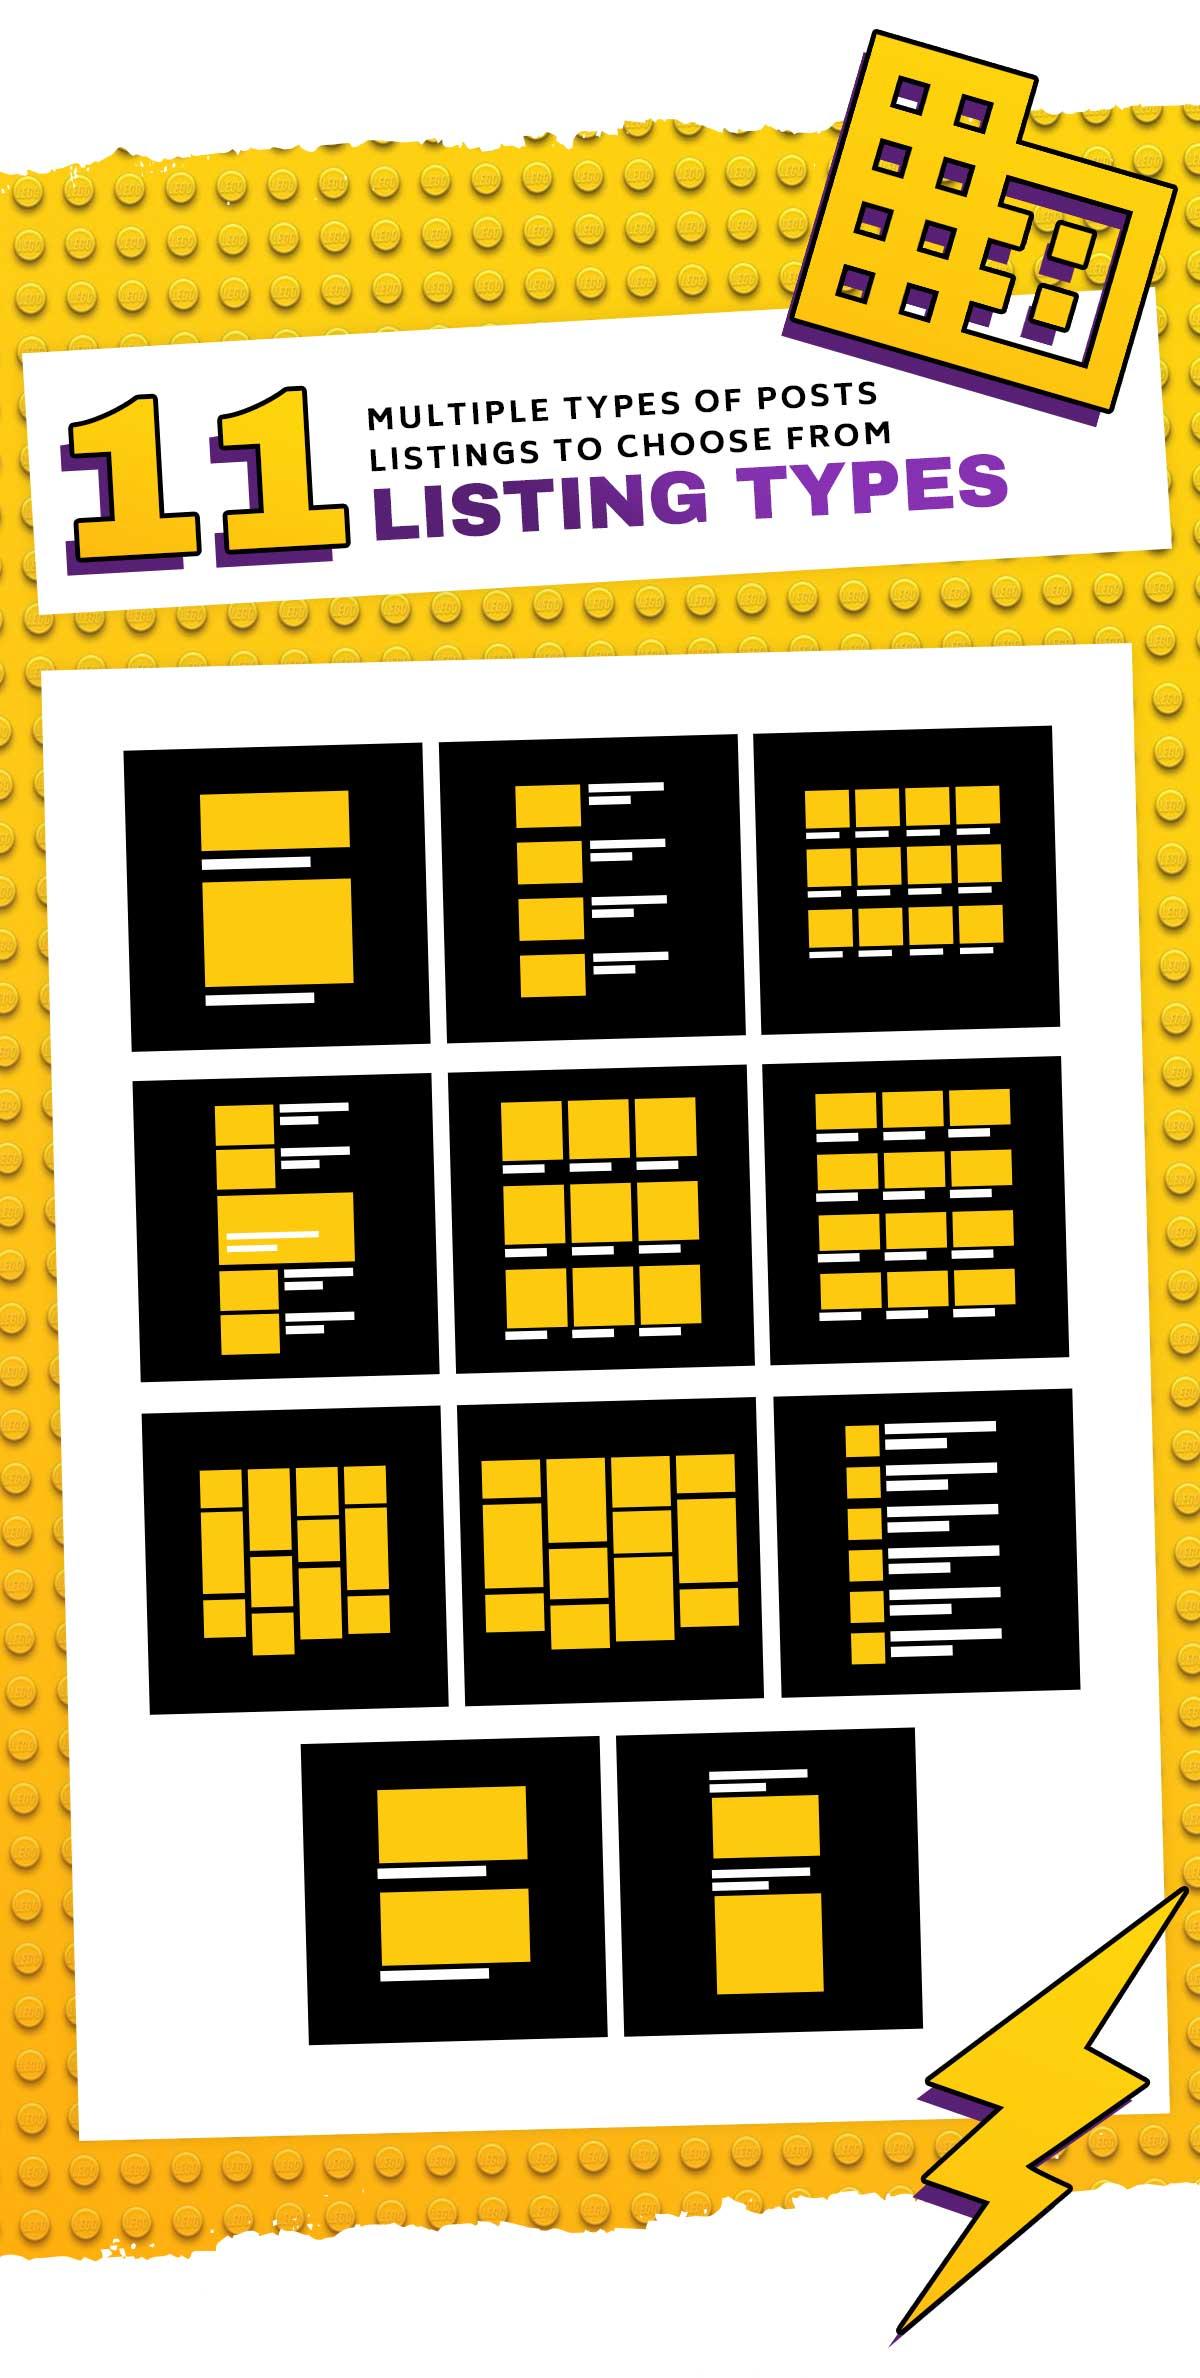 img 6011a01c3b6f7 - دانلود قالب وردپرس BoomBox - پوسته مجله خبری و Viral وردپرس